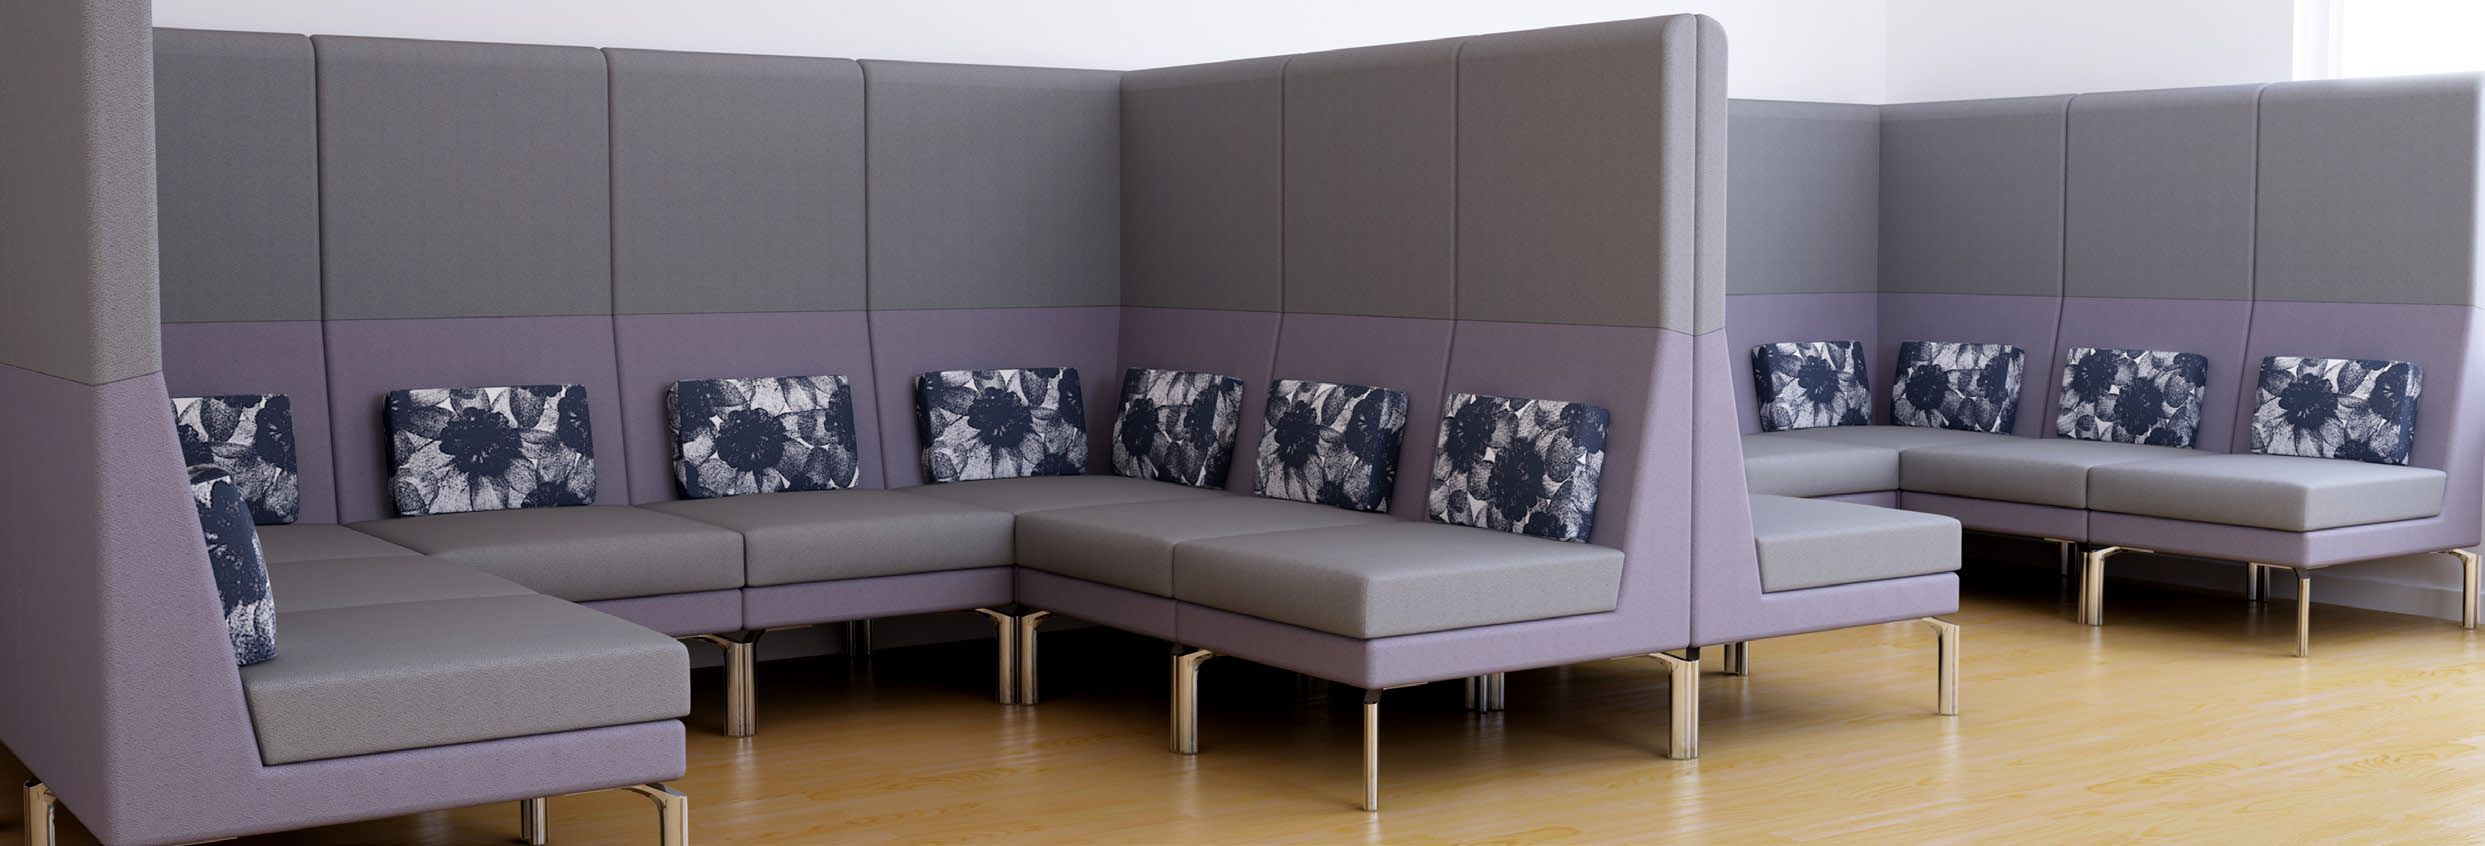 Casa Andrea Milano Sectional Sofa Mexico Sillones Modernos Individuales 4 Articulos Interesantes